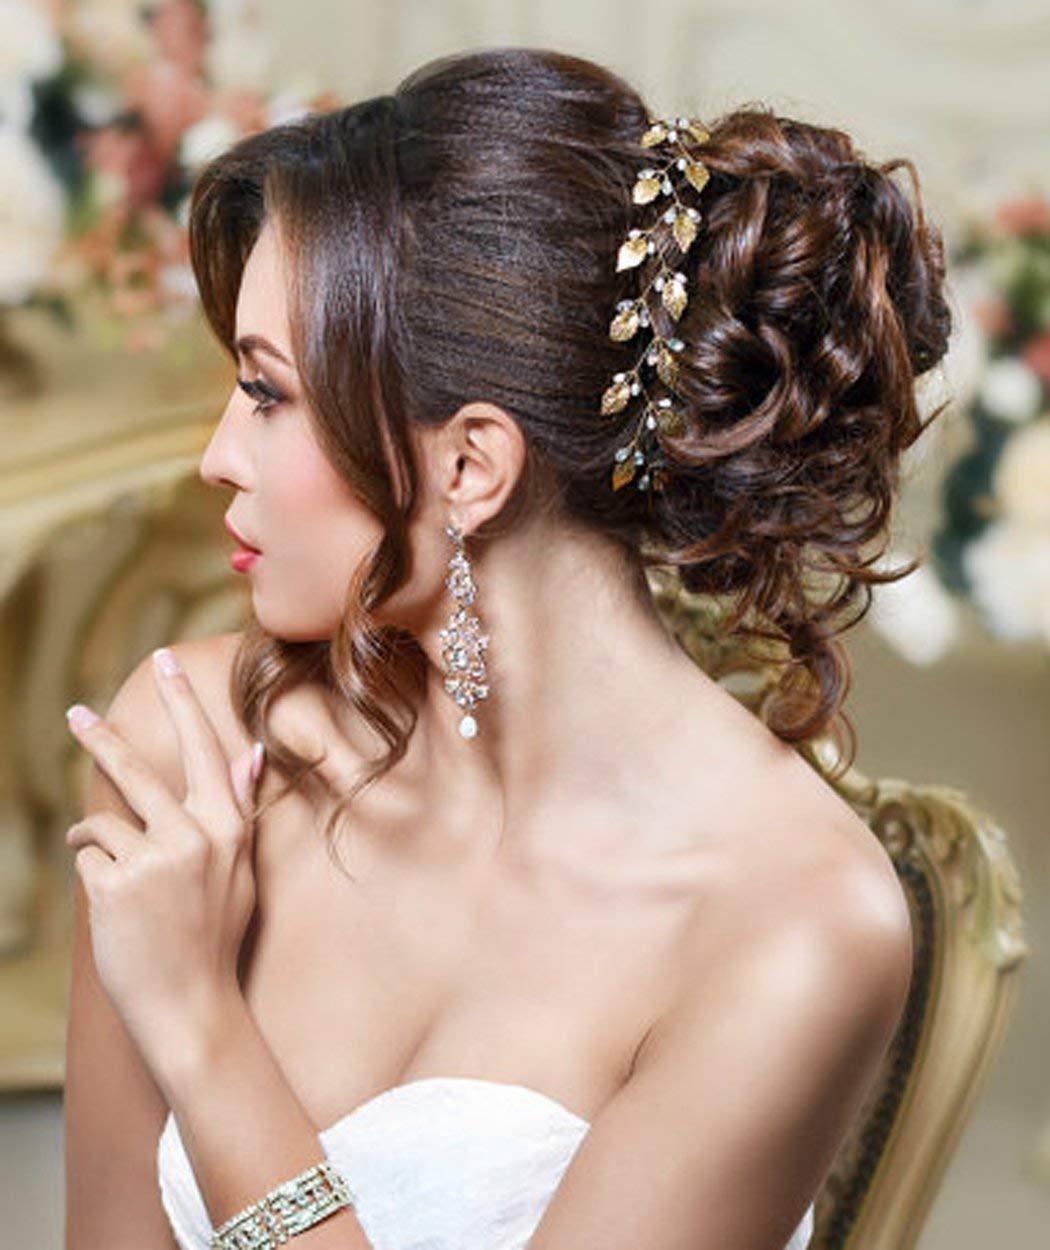 Amazon.com : Golden Leaf Headband Bridal